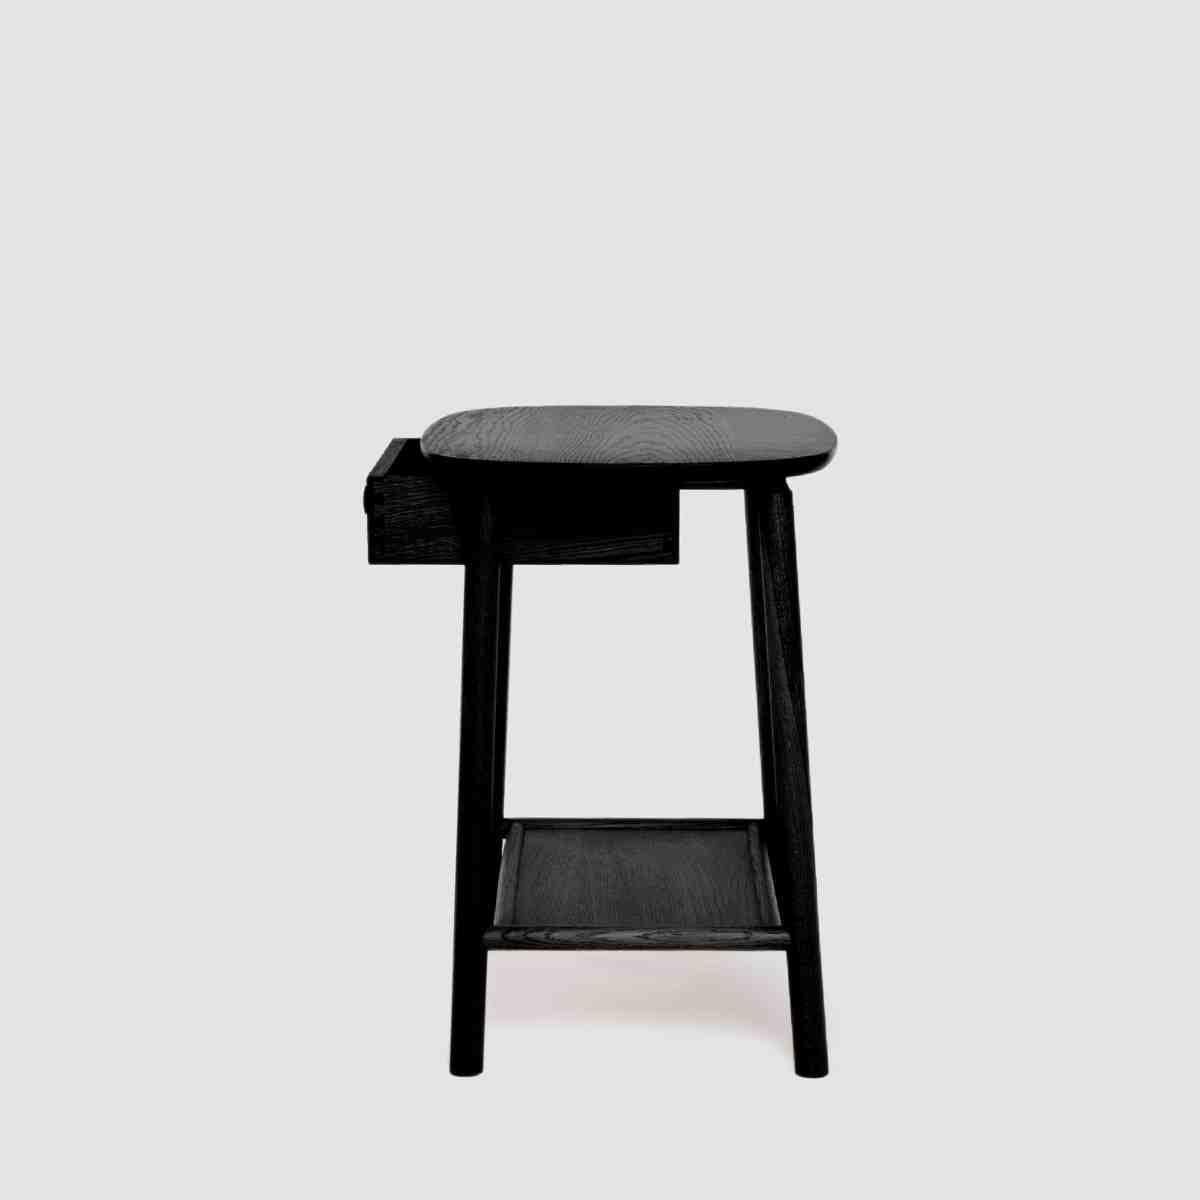 Hardy_Side_Table_Drawer_Black_004